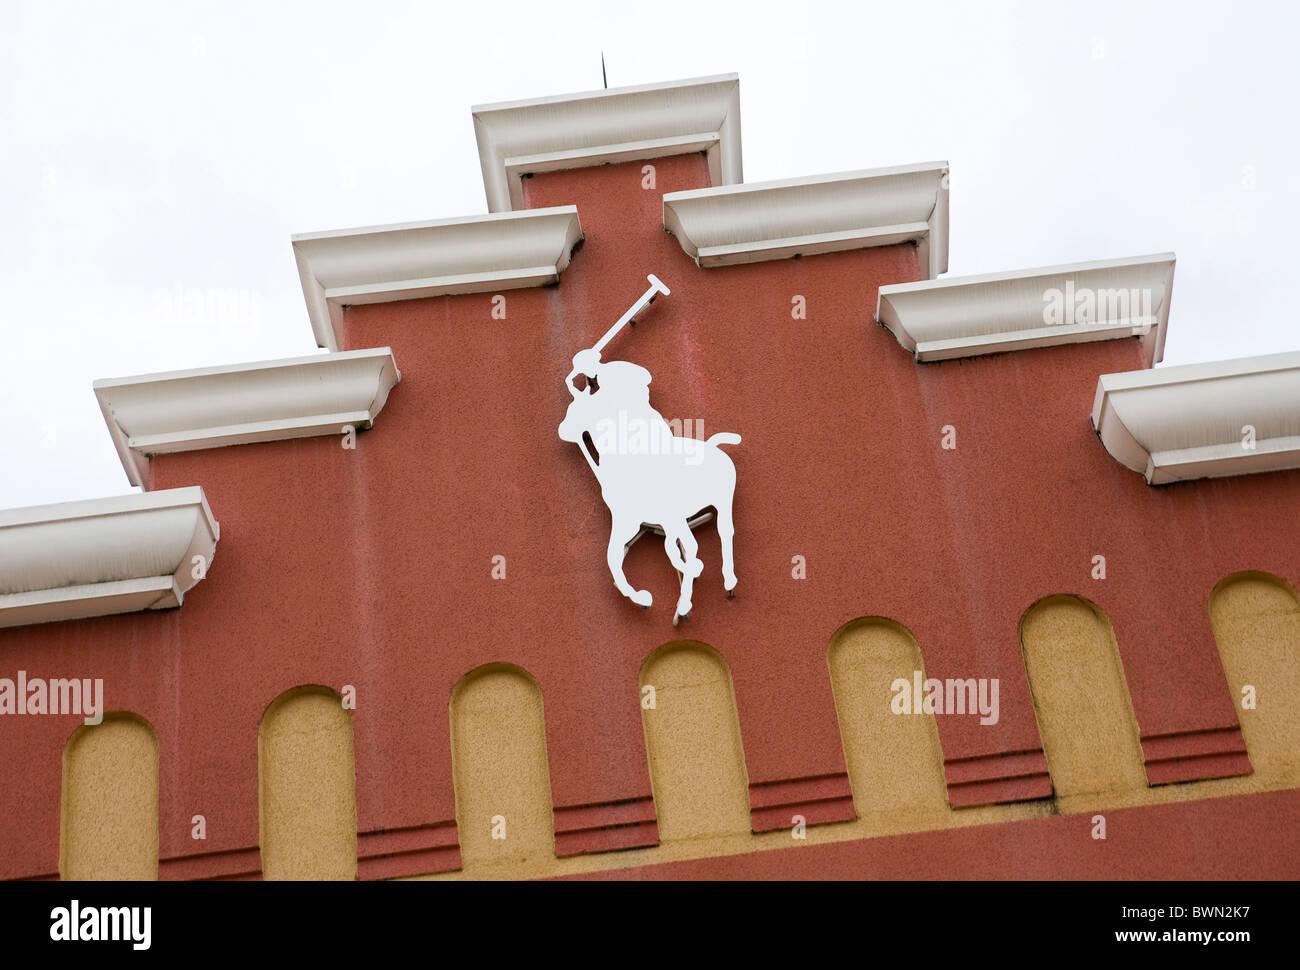 Ralph Lauren Store Shop Stockfotos   Ralph Lauren Store Shop Bilder ... cfb5409fd5